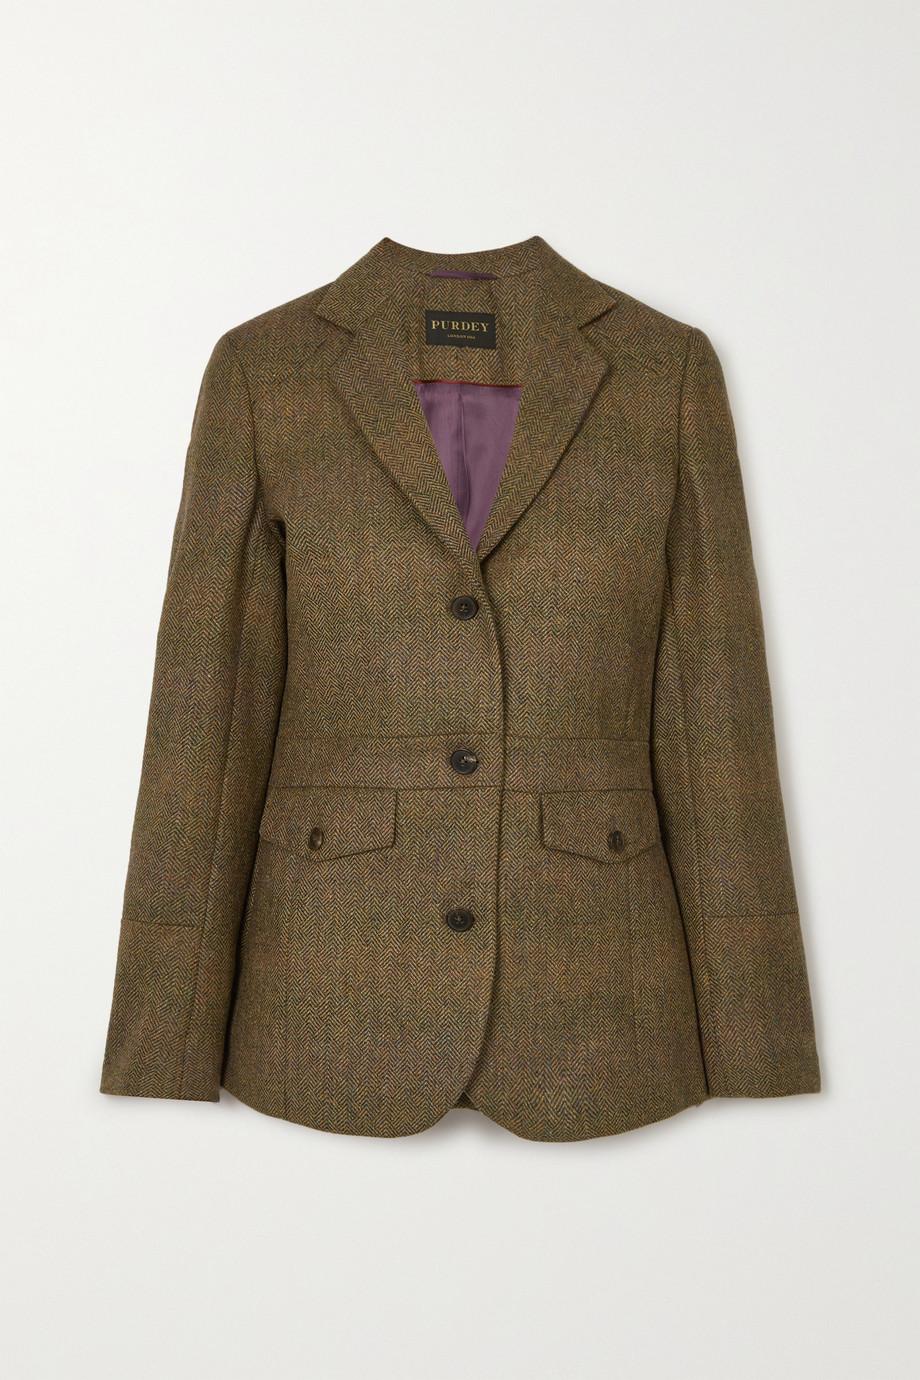 Purdey Wool-tweed blazer